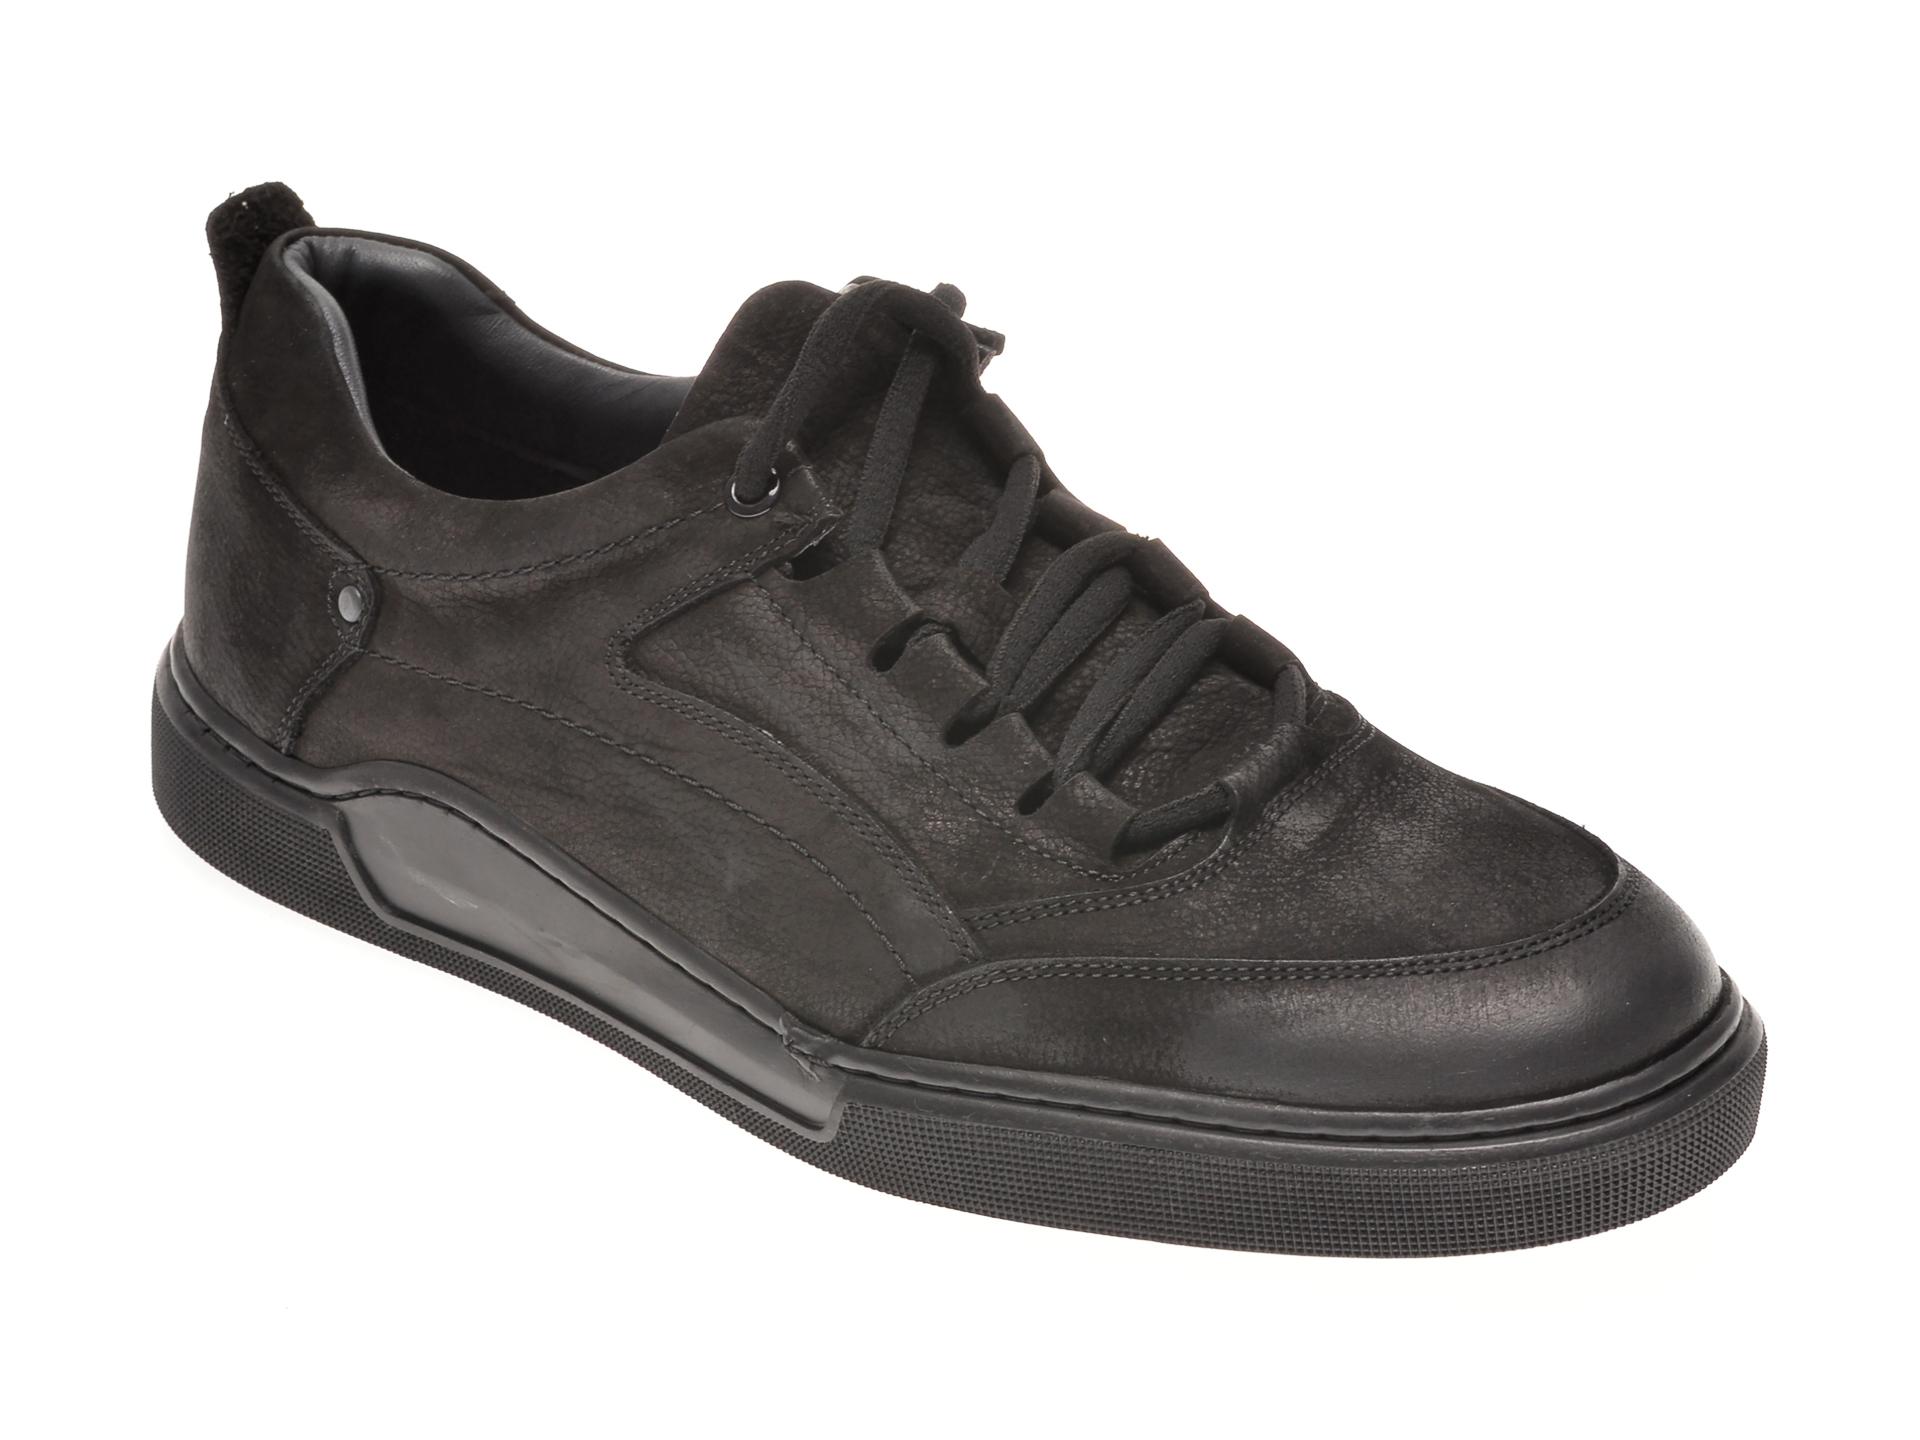 Pantofi OTTER negri, 48707, din nabuc New